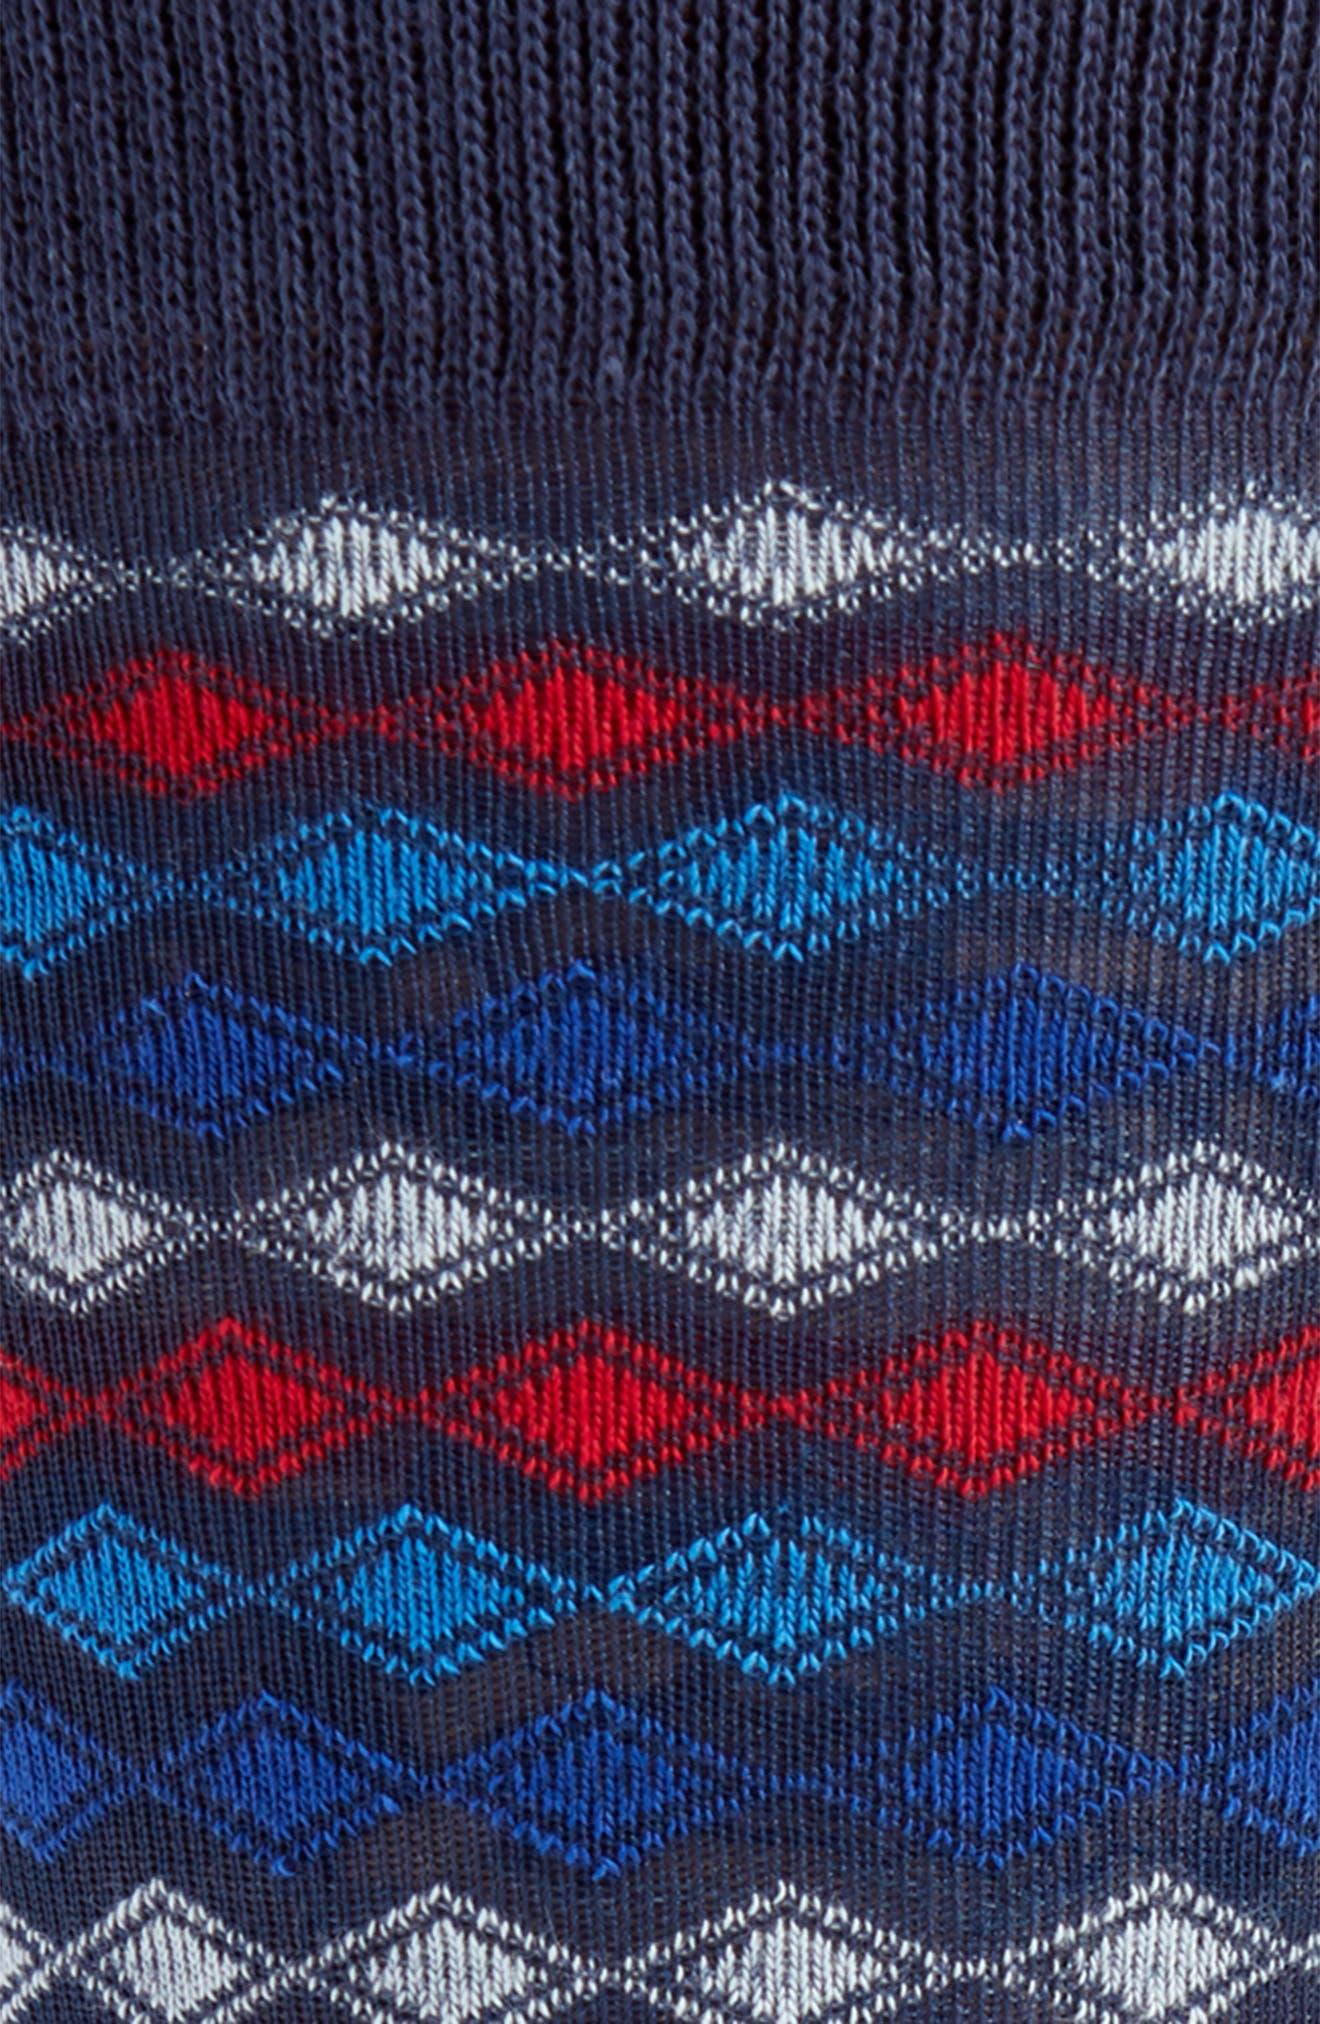 Striped Diamond Grid Socks,                             Alternate thumbnail 2, color,                             Navy/ Red